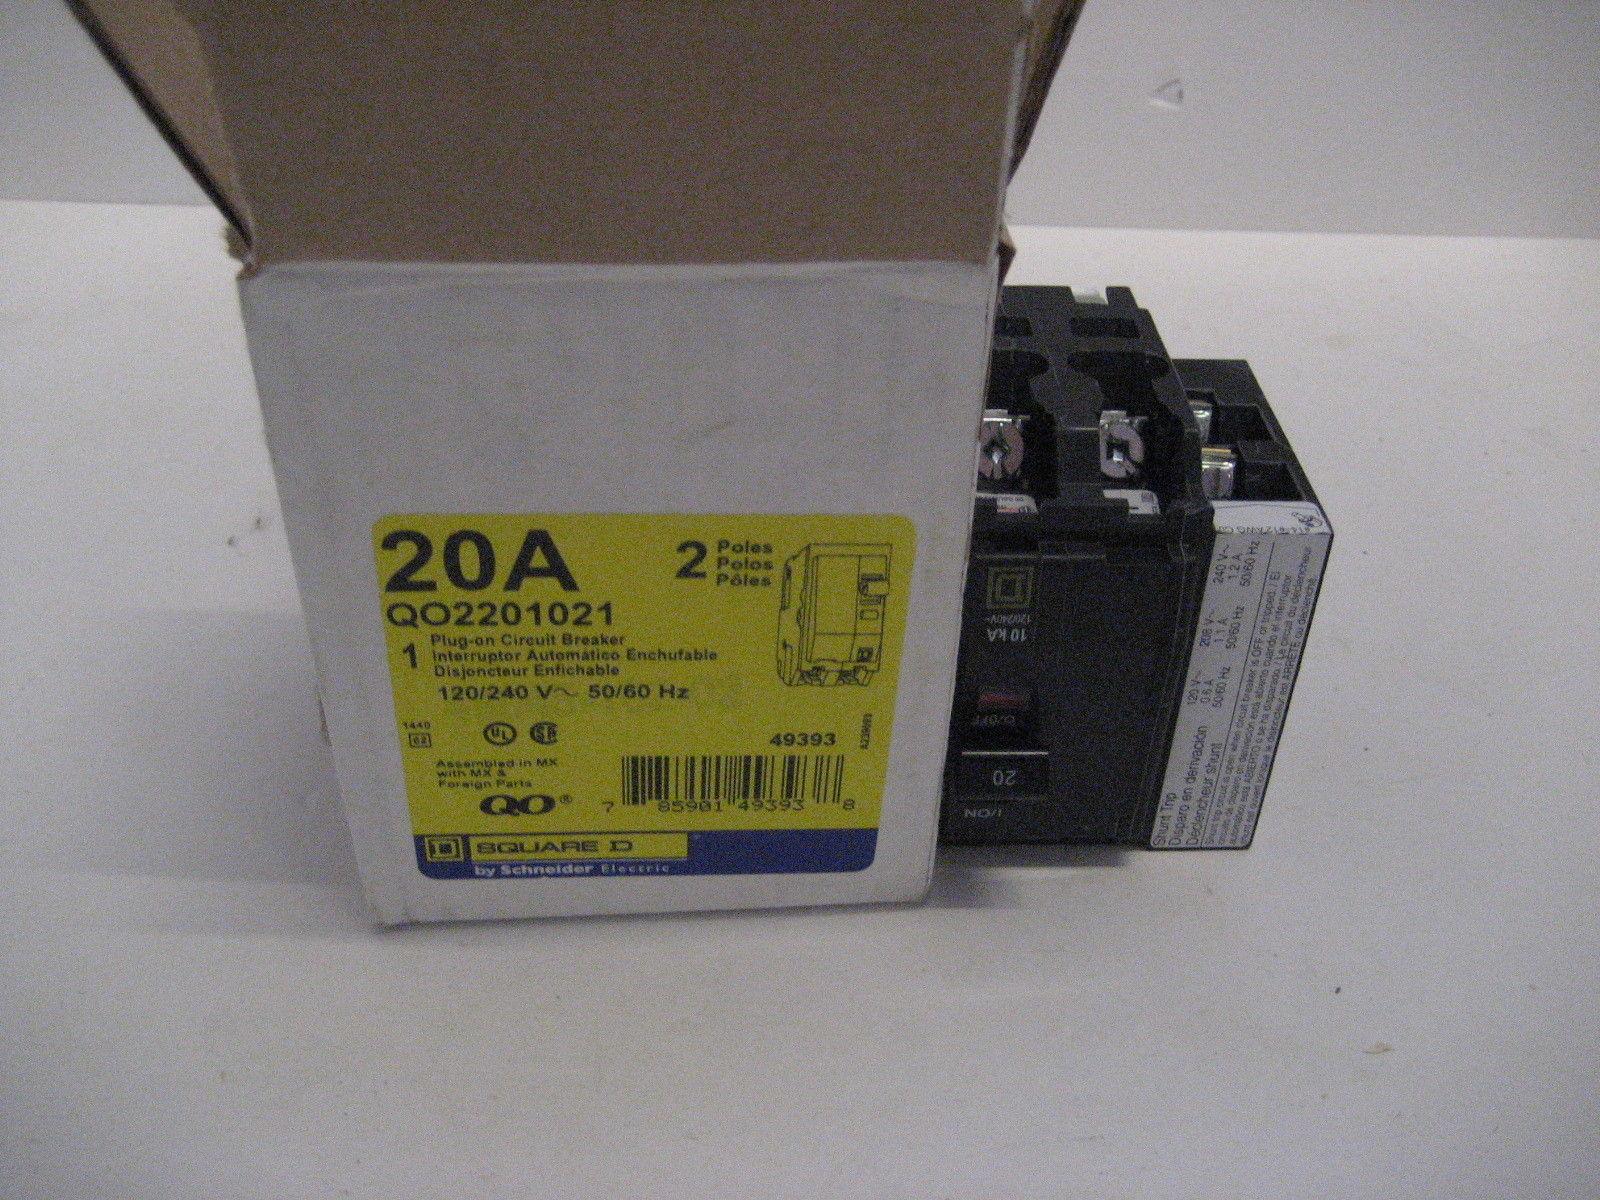 New In Box Square D Breaker Qo2201021 Shunt Trip Qo220 1021 Qo Trippingcircuitbreakerpaneljpg